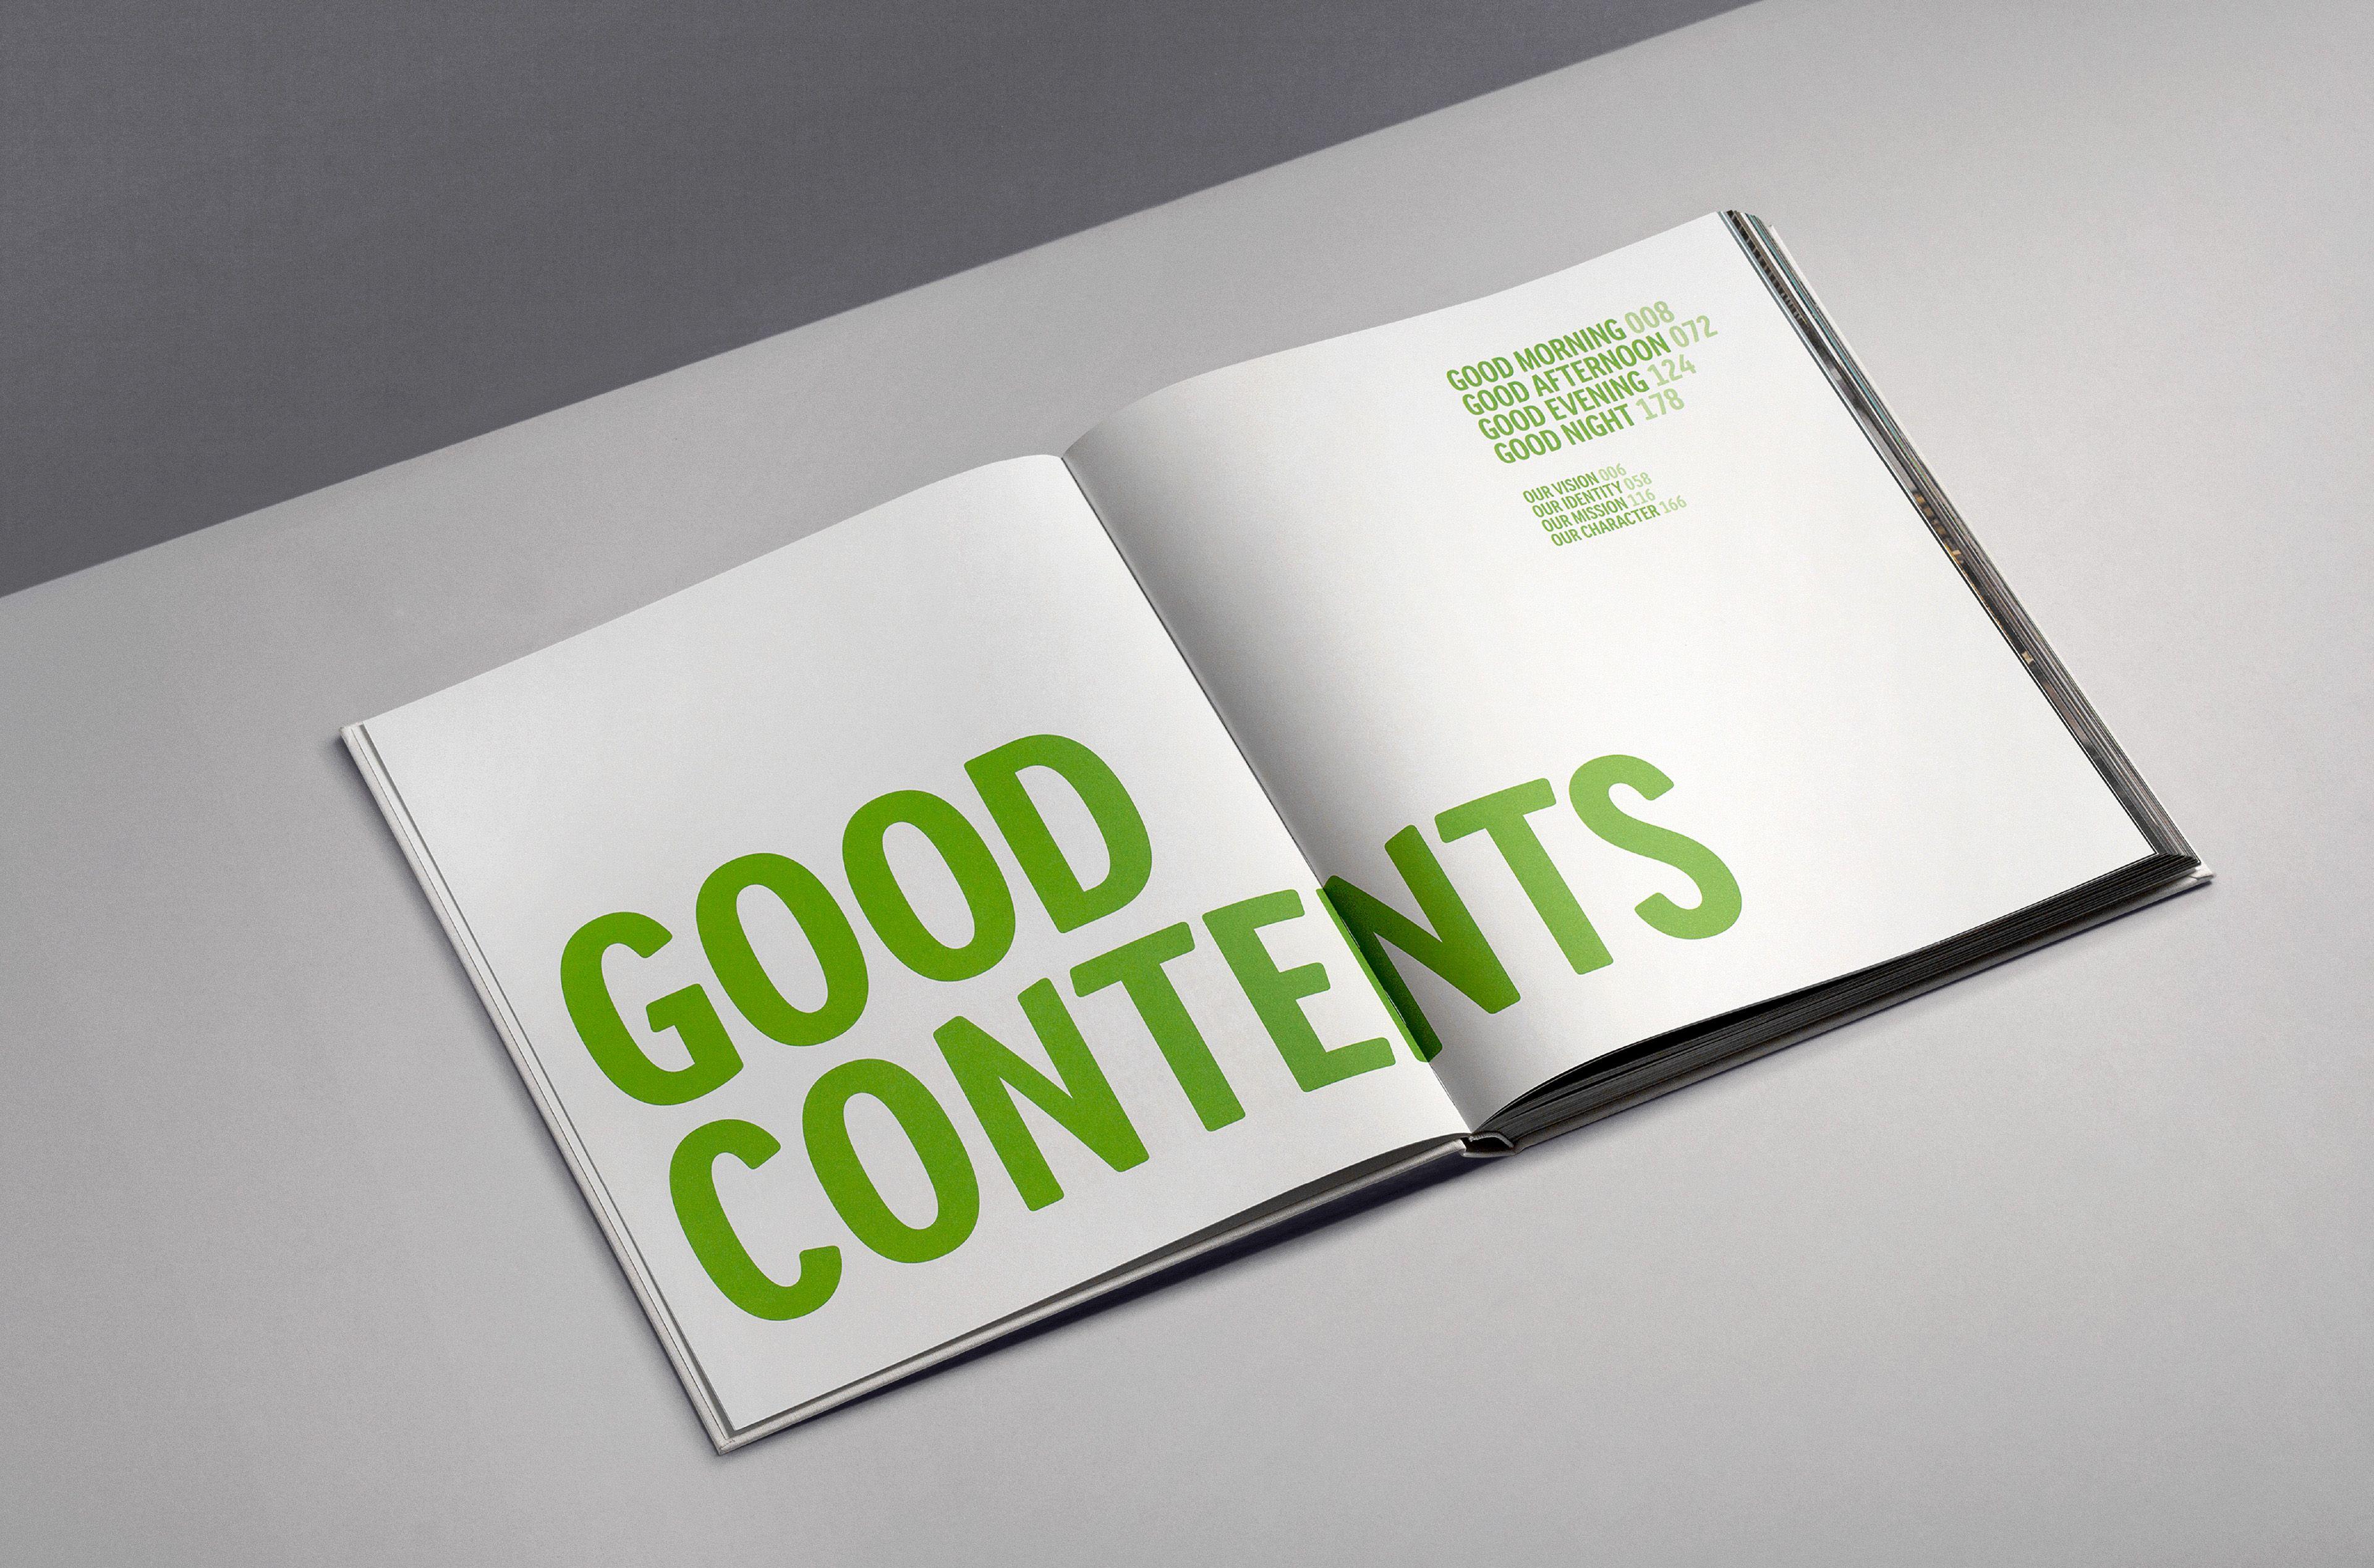 Arla Foods, Good Growth Book Books, Growth, Best